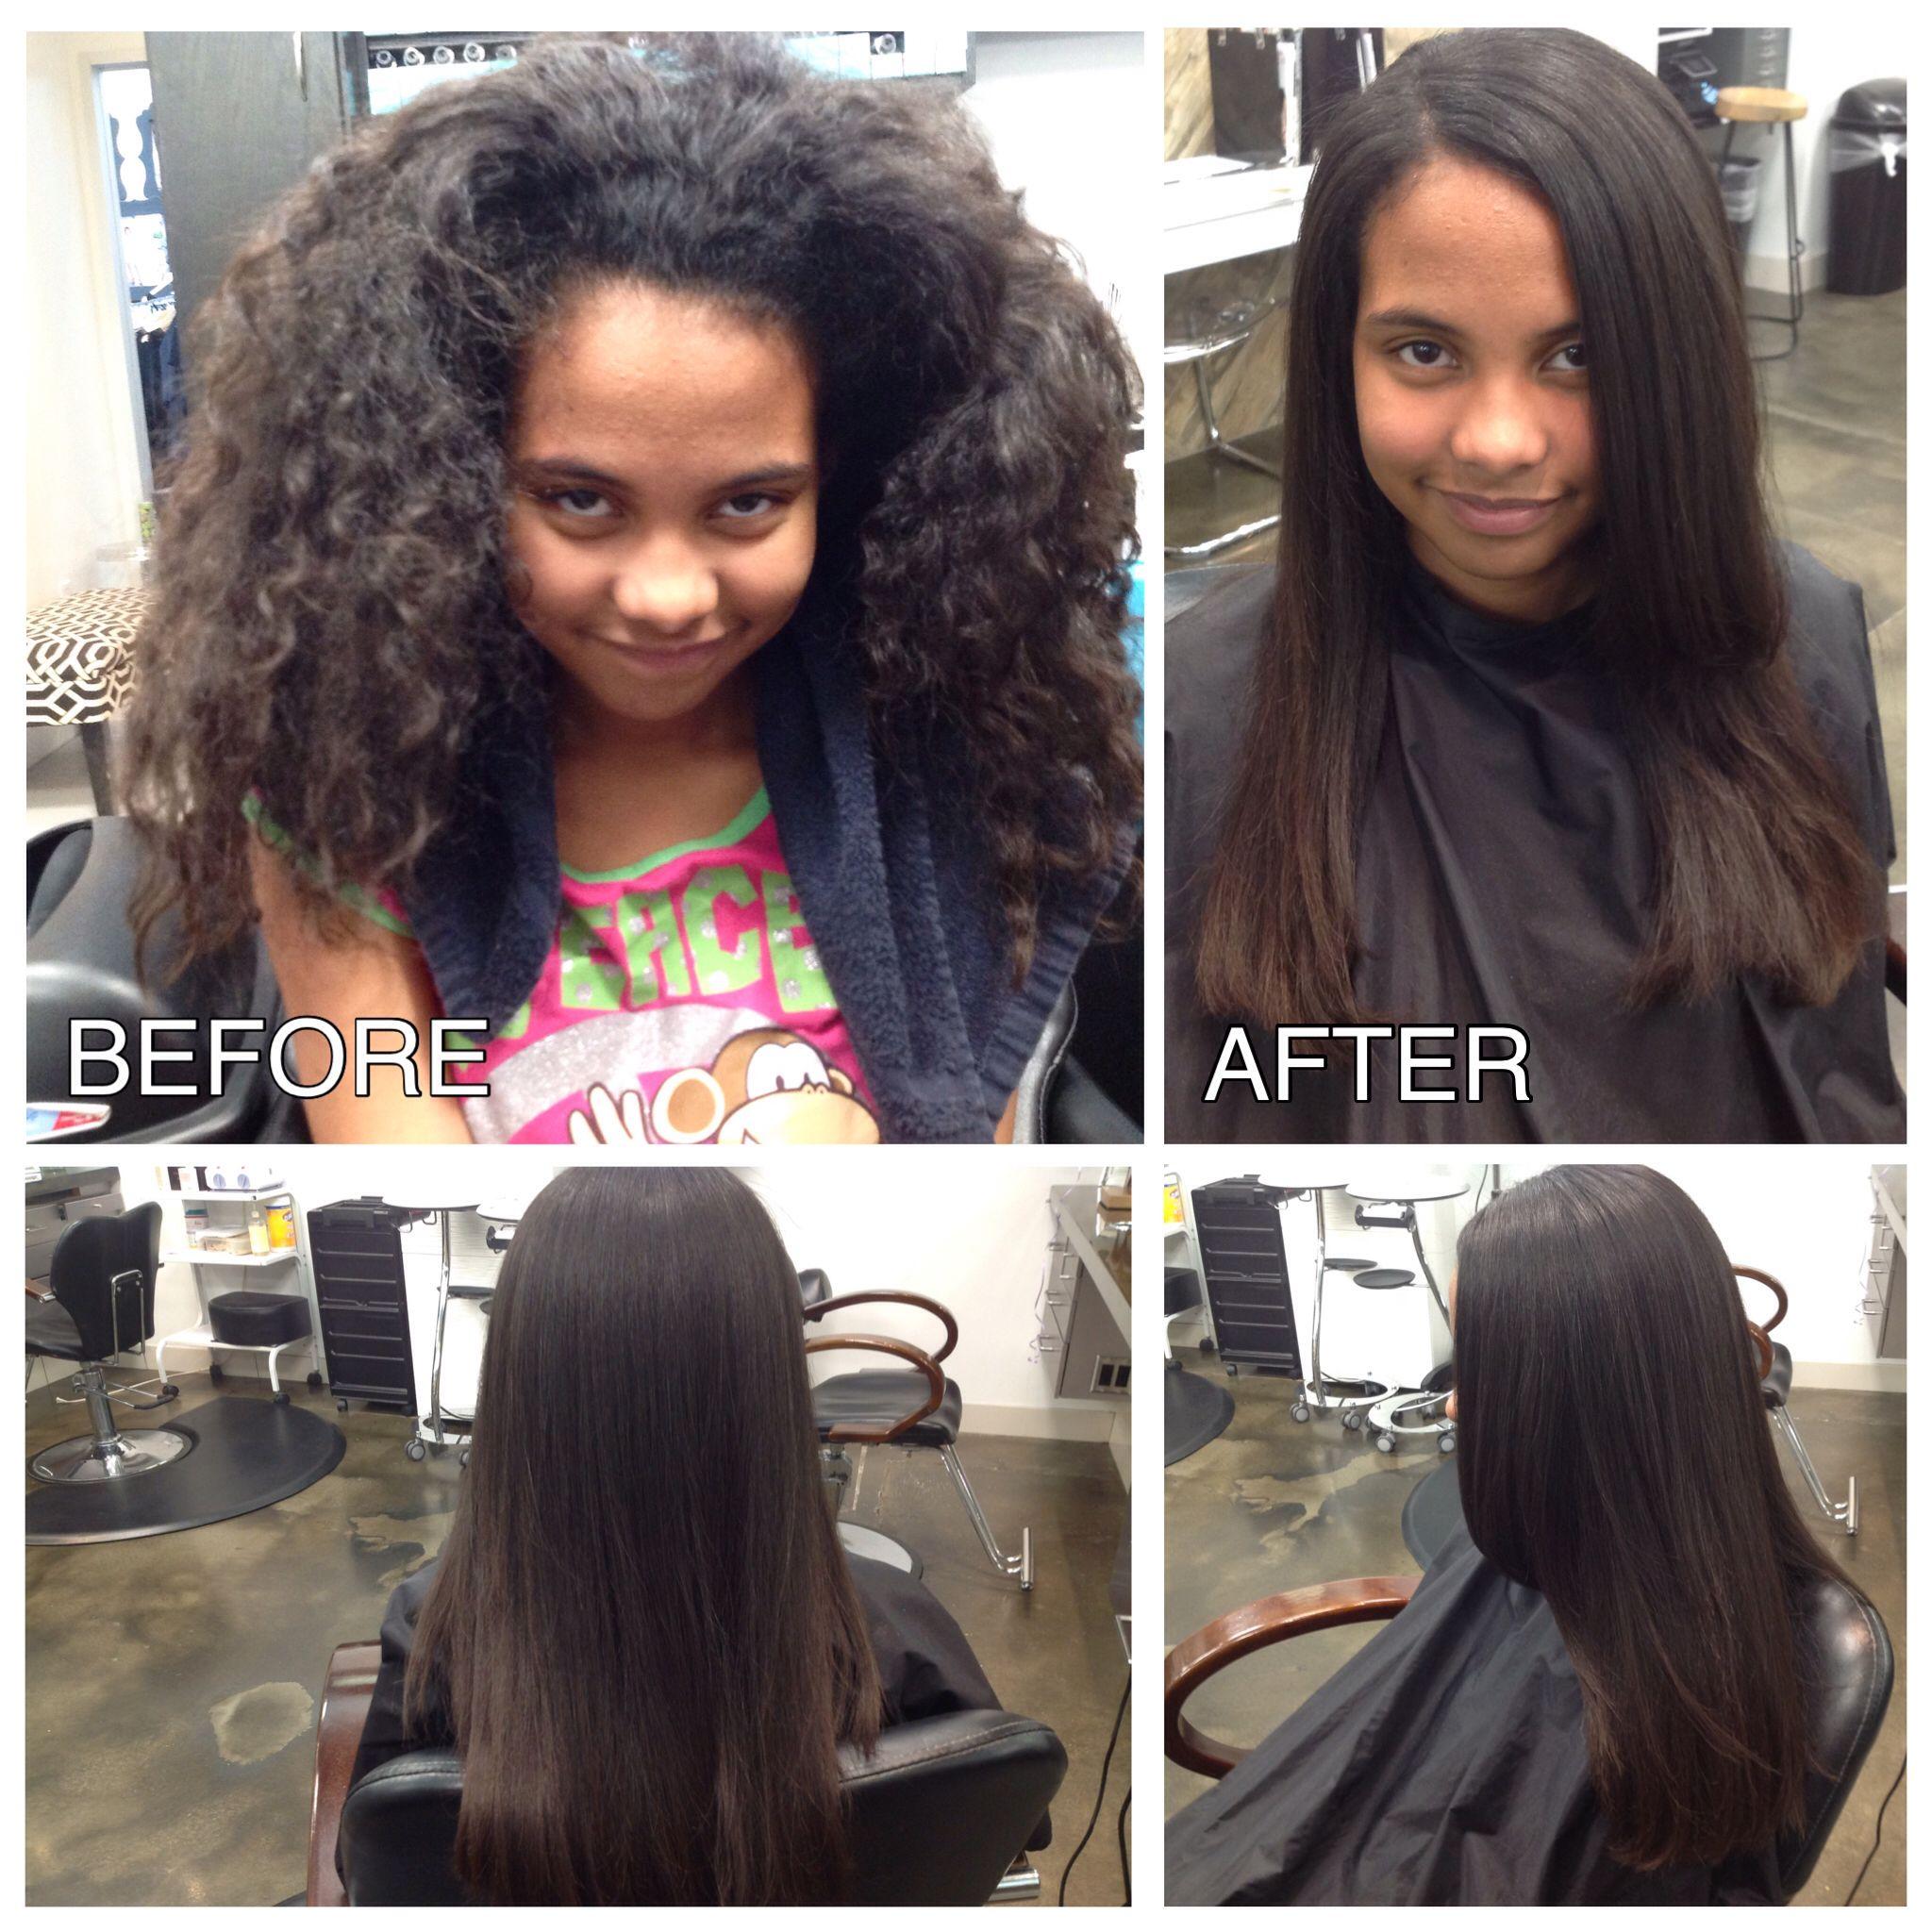 Before And After Brazilianblowout Brazilianblowout Frizz Hair Thewoodlands 77389 Brazilian Blowout Frizz Hair